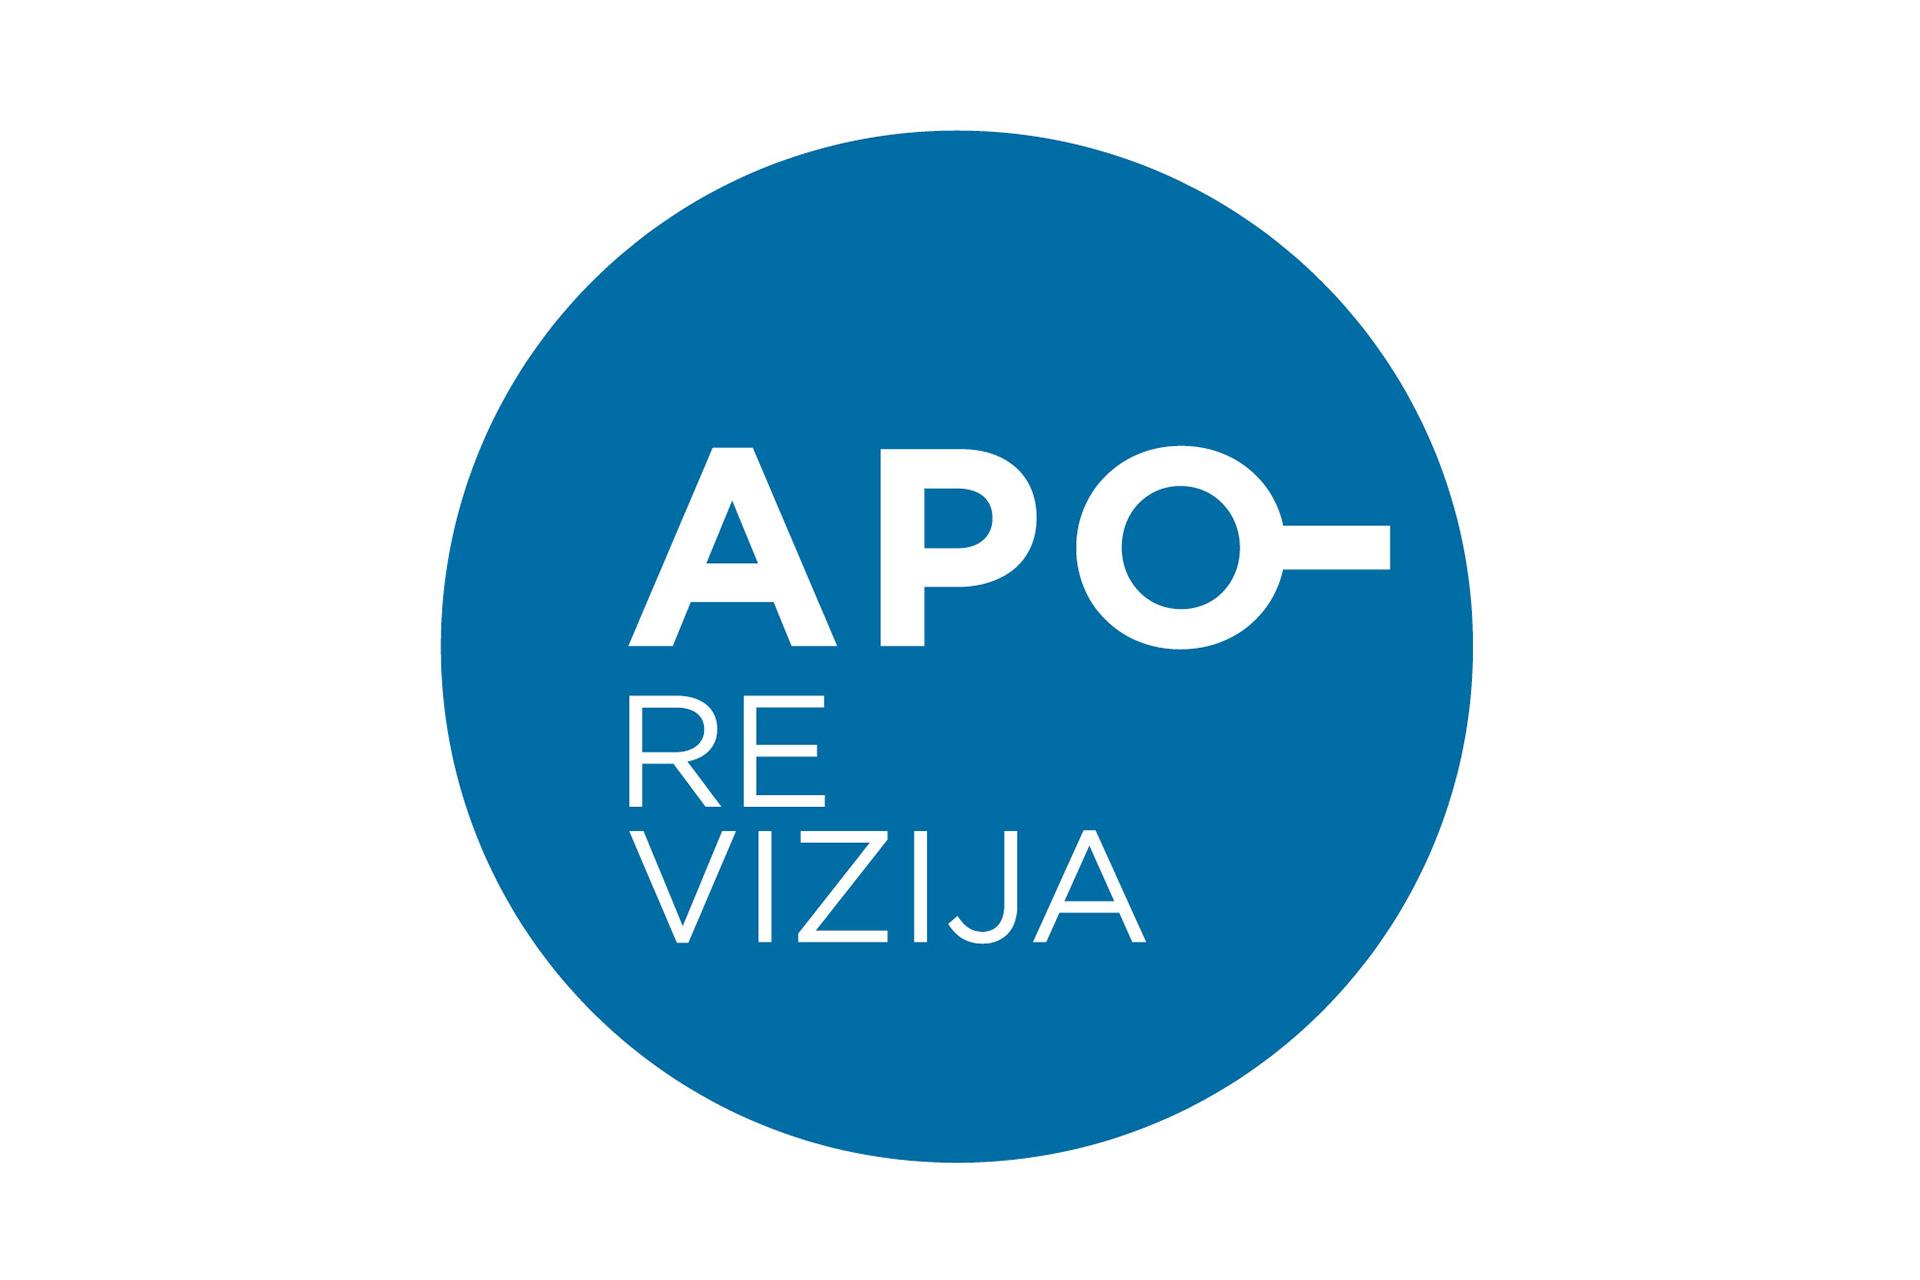 apo_revizija_cgp3